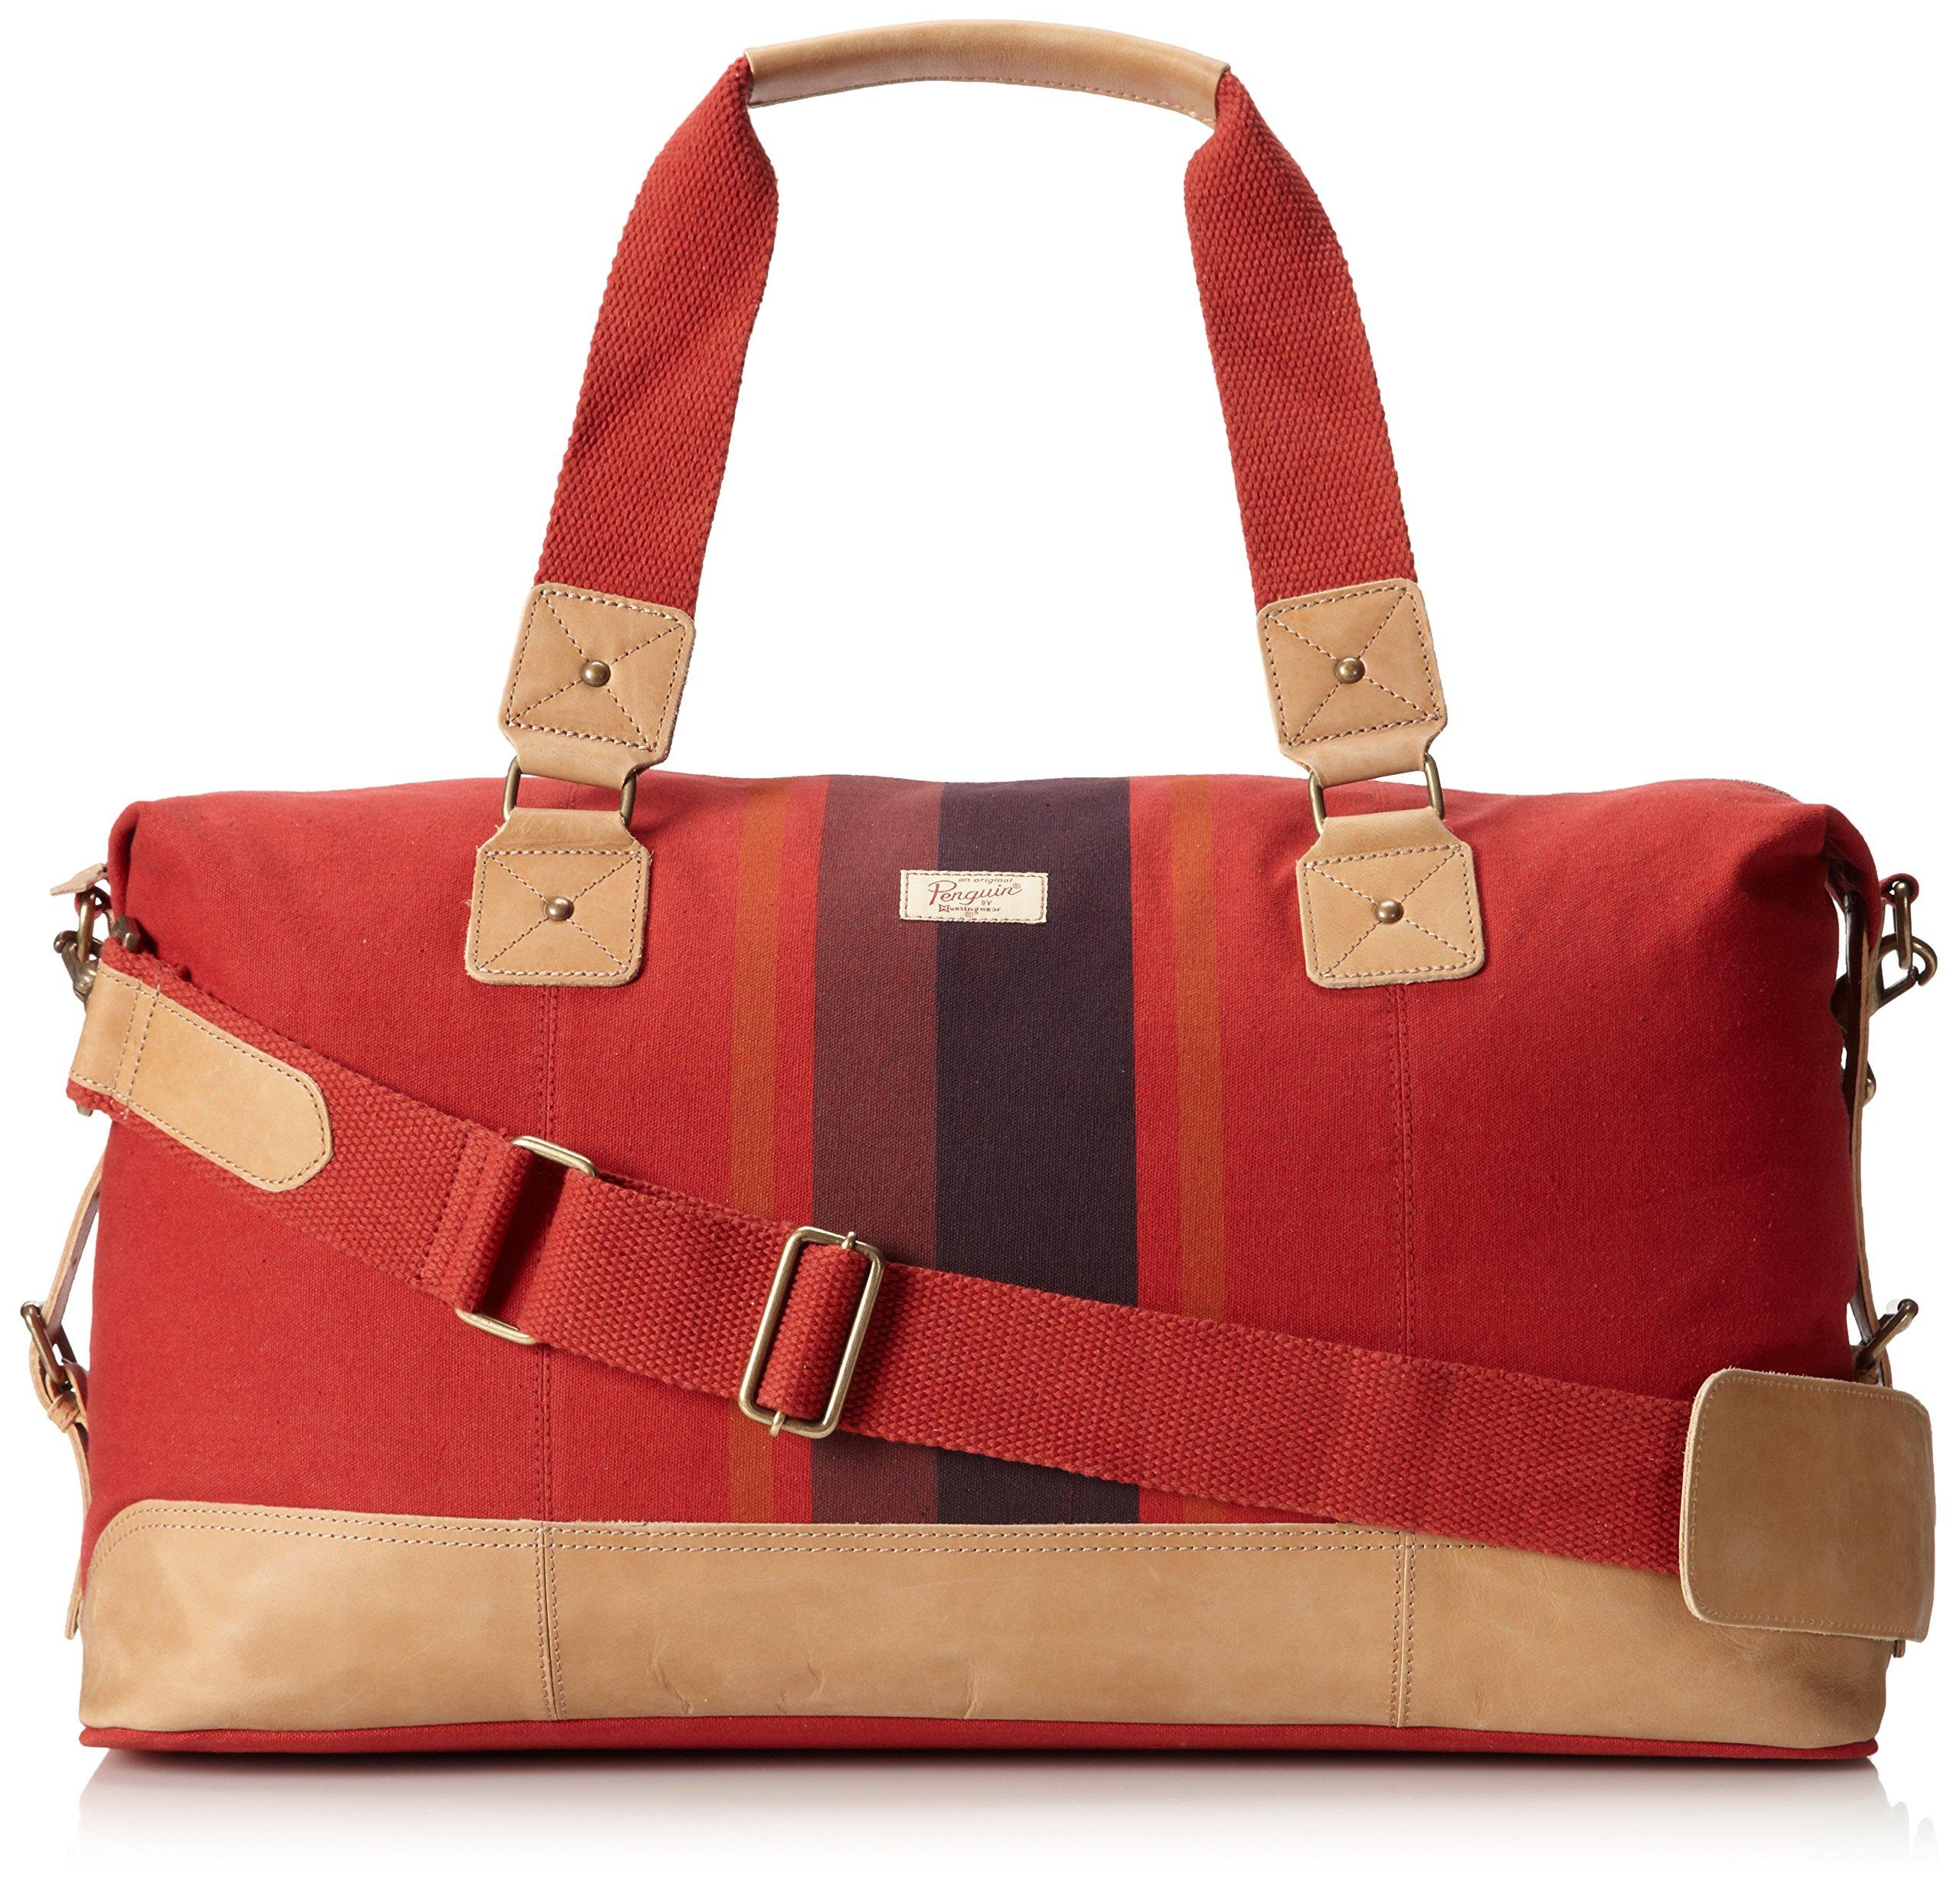 Original Penguin Men's Canvas Weekend Bag Duffel Bag, Pompeian Red, One Size by Original Penguin (Image #1)